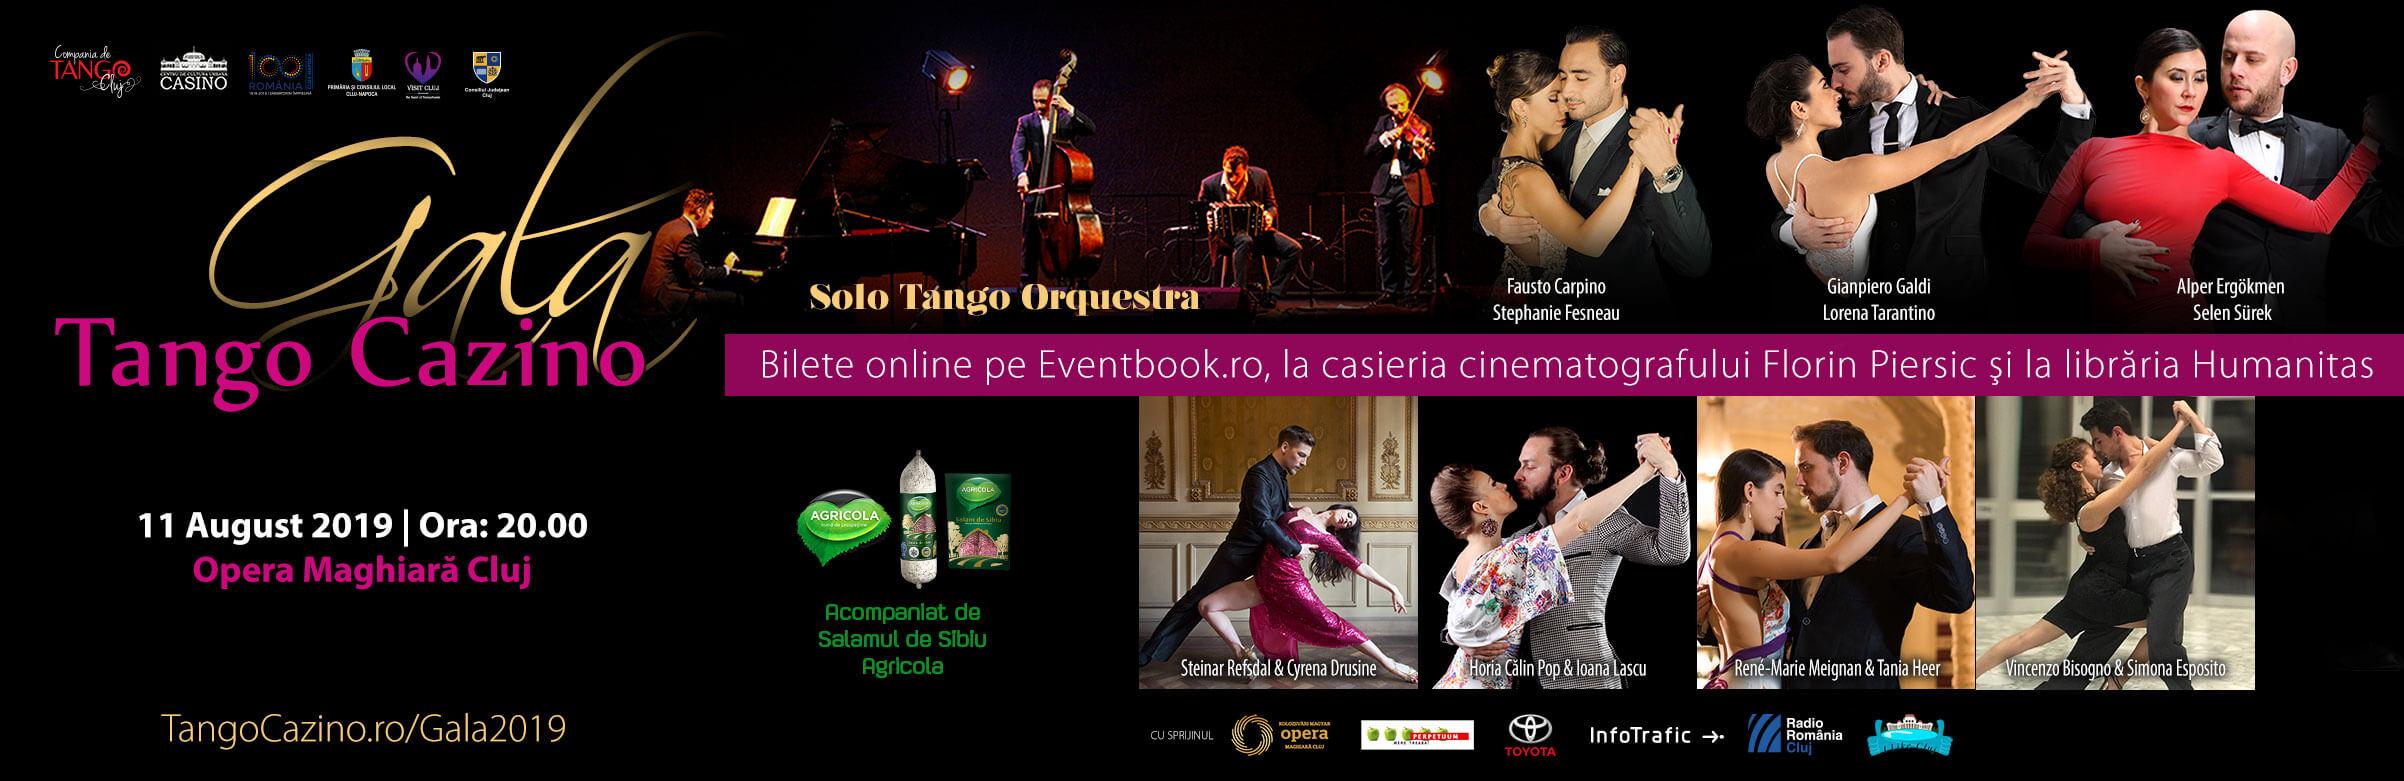 Gala Tango Cazino 2019